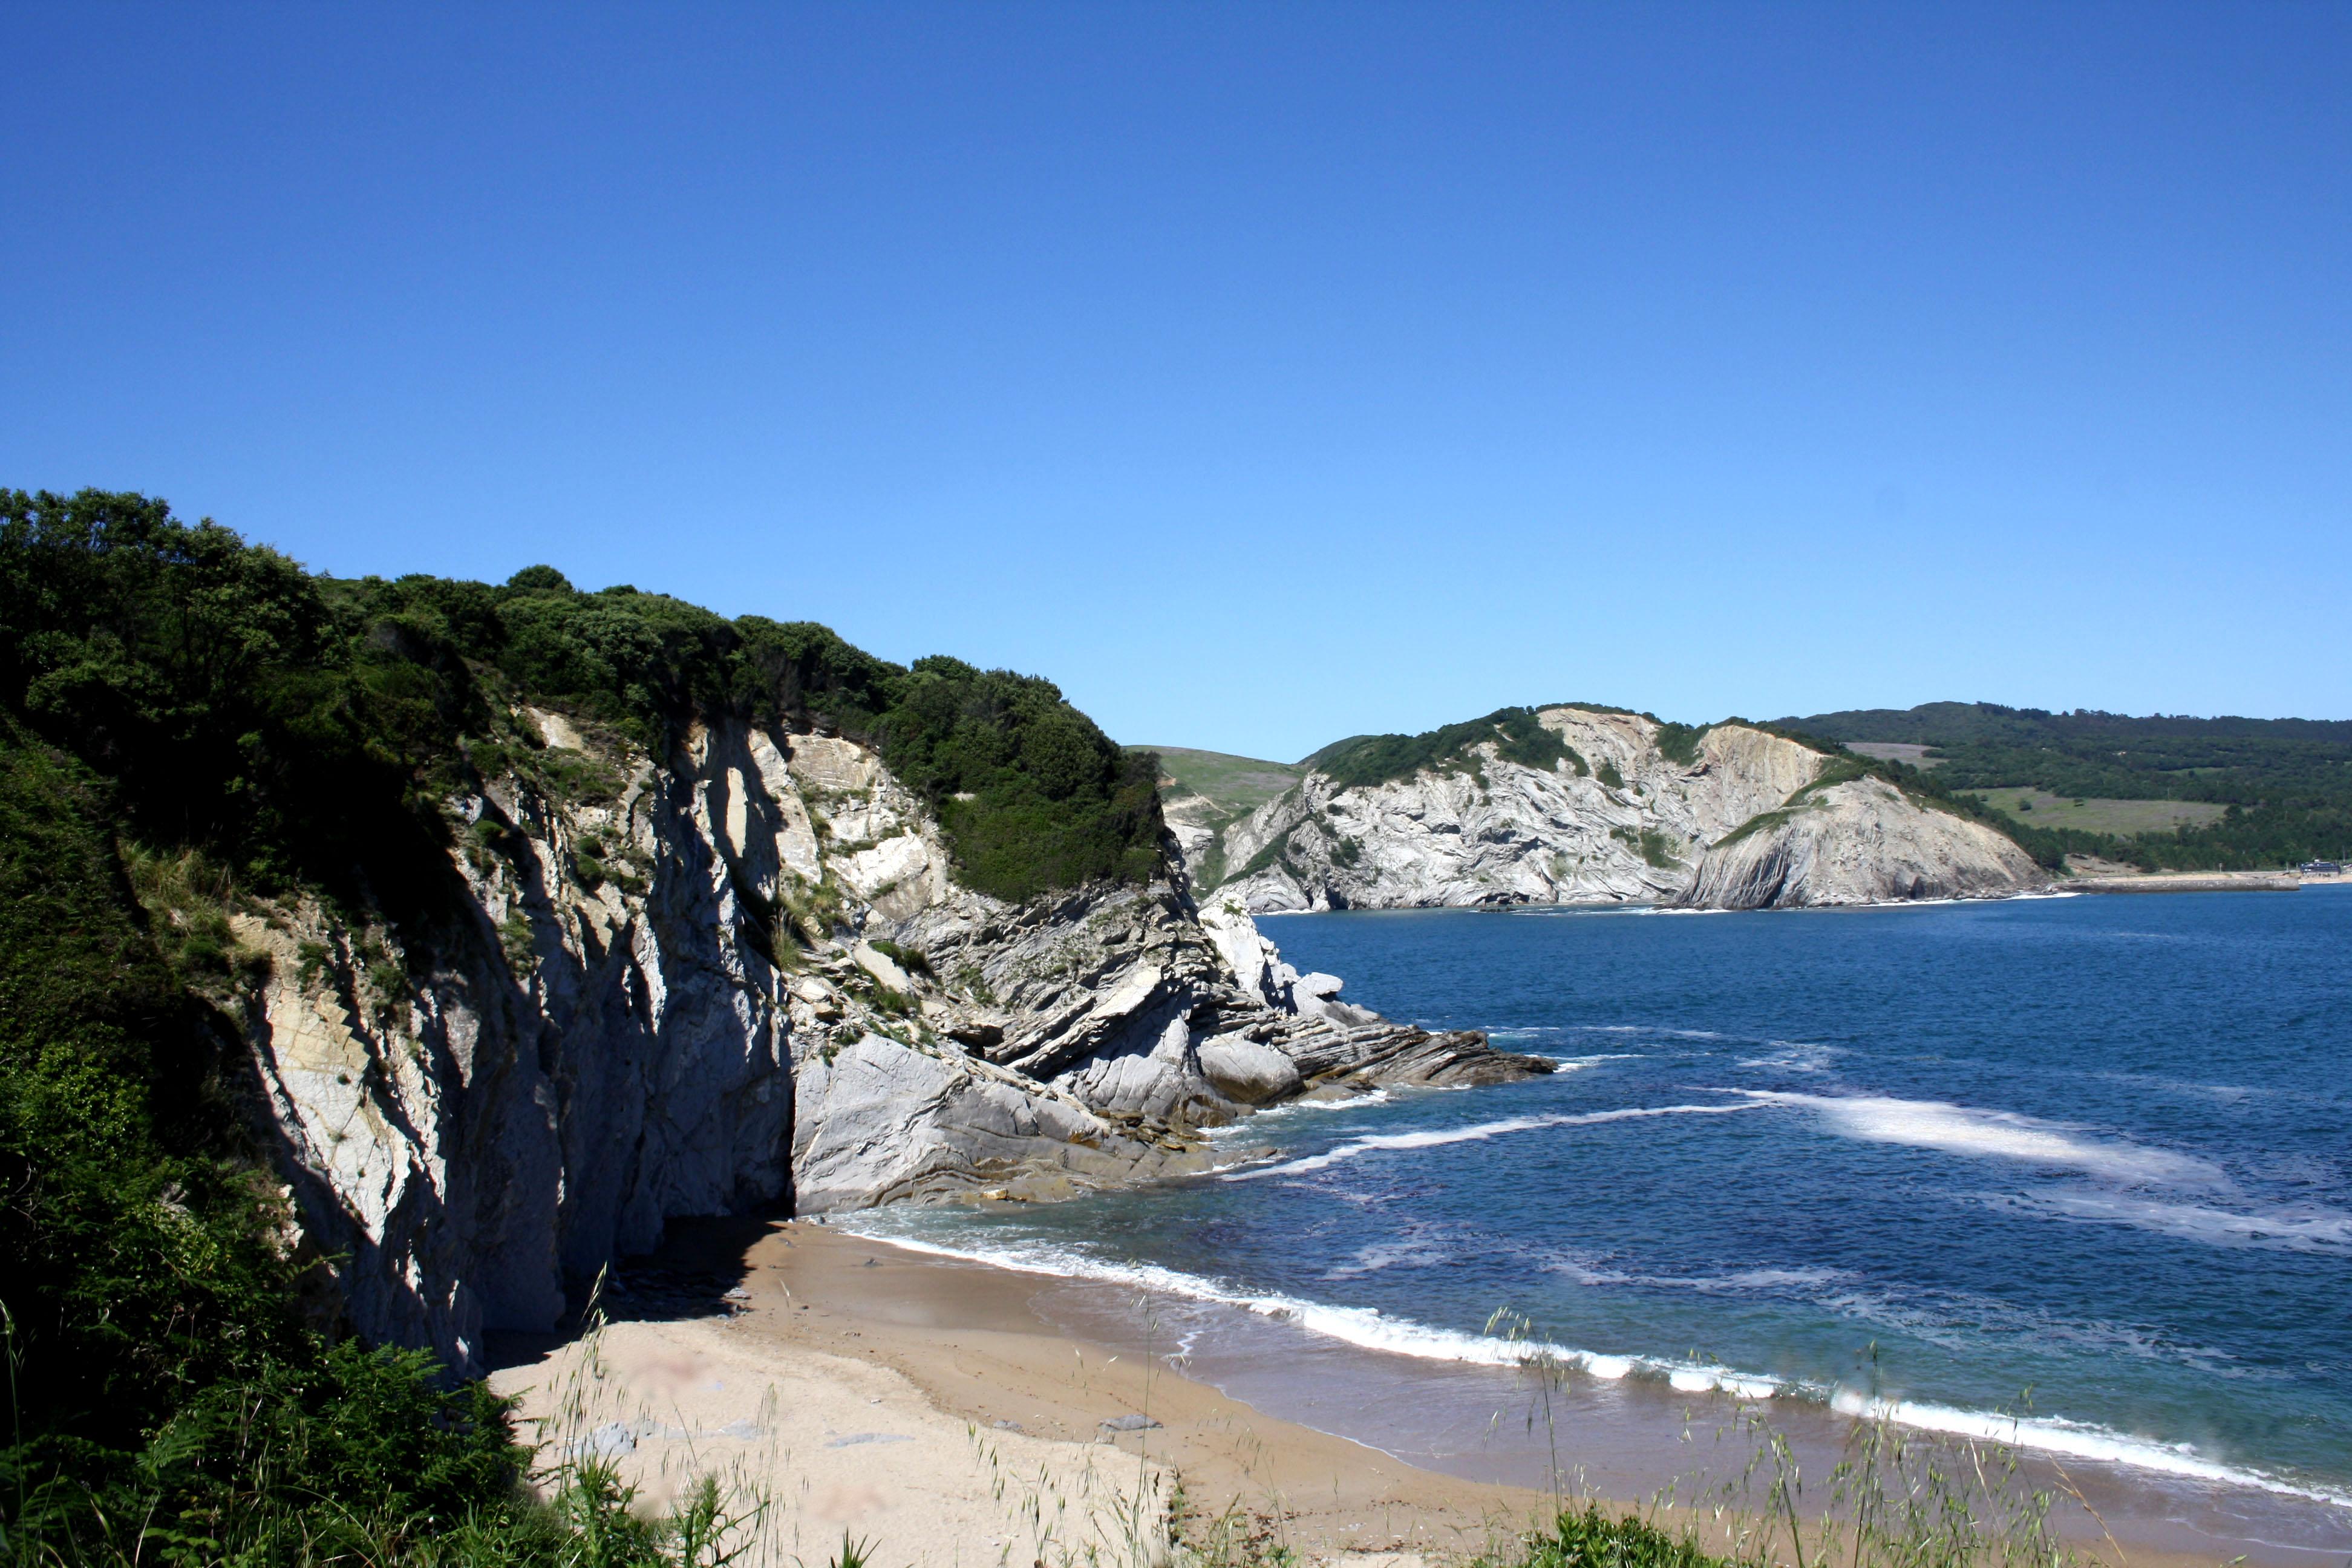 Playa de Muriola